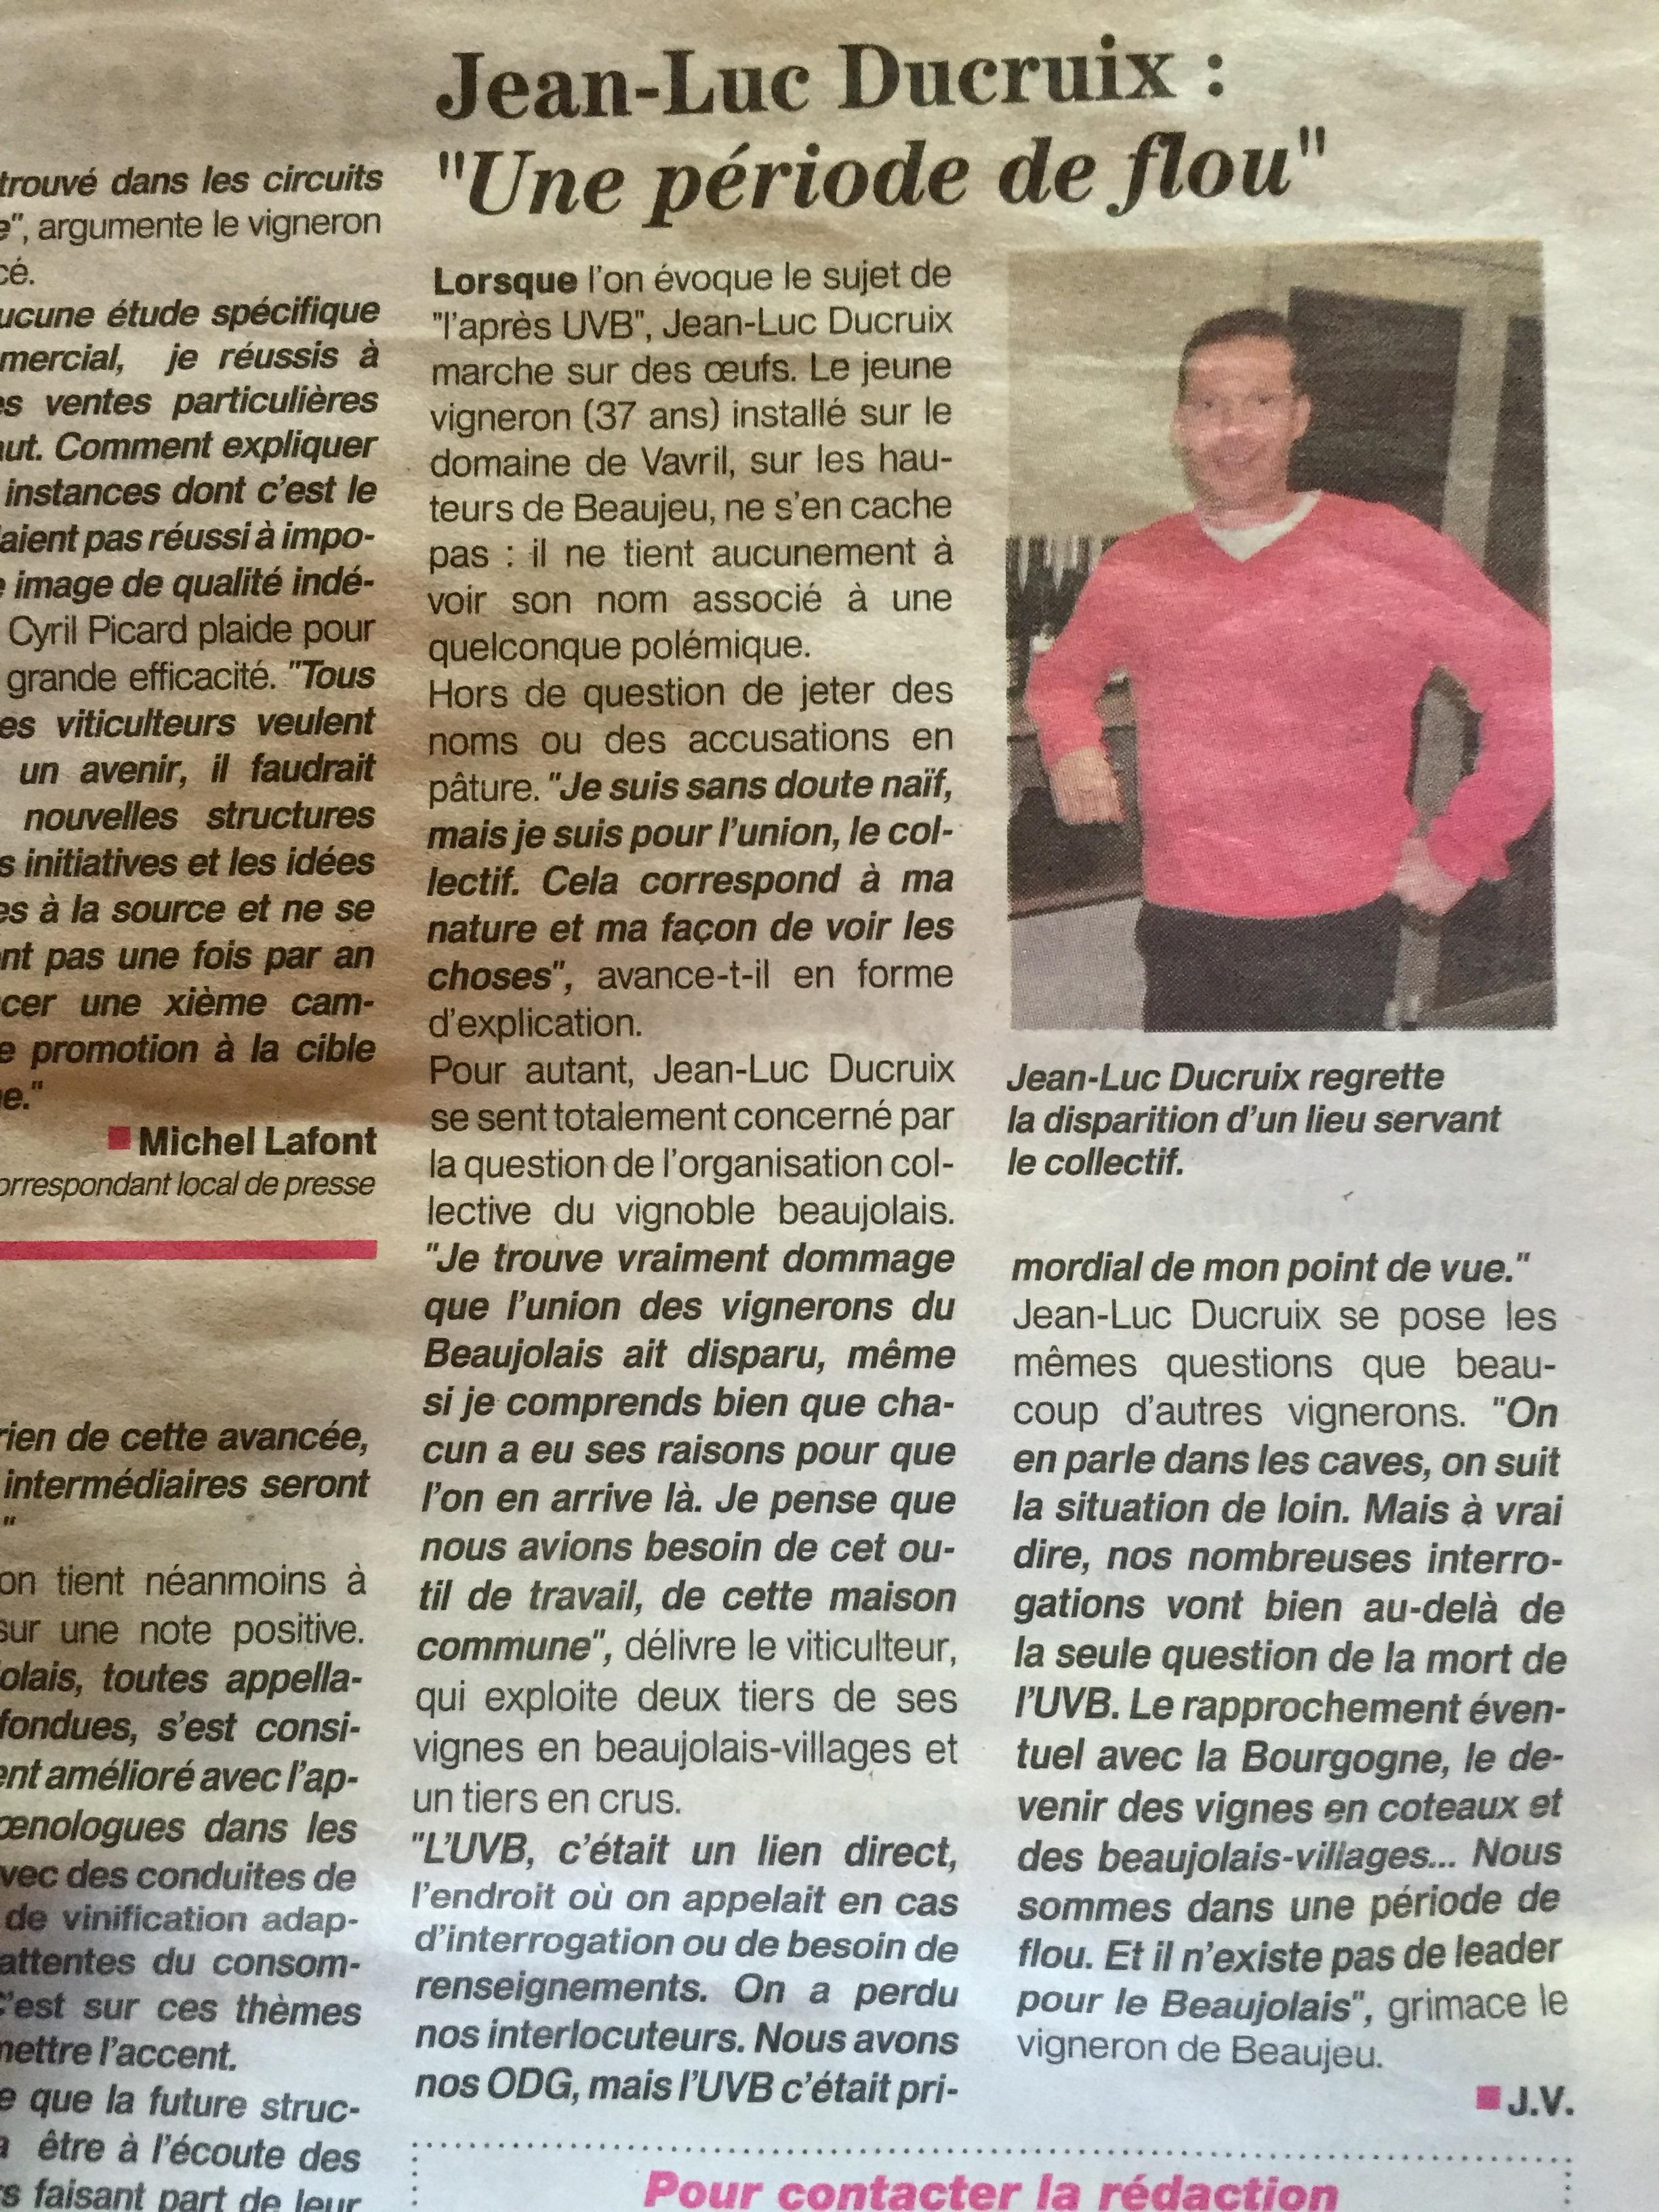 Le Patriote Beaujolais Val de Saone - Jean-Luc Ducruix 21-01-2016 - Une période de flou